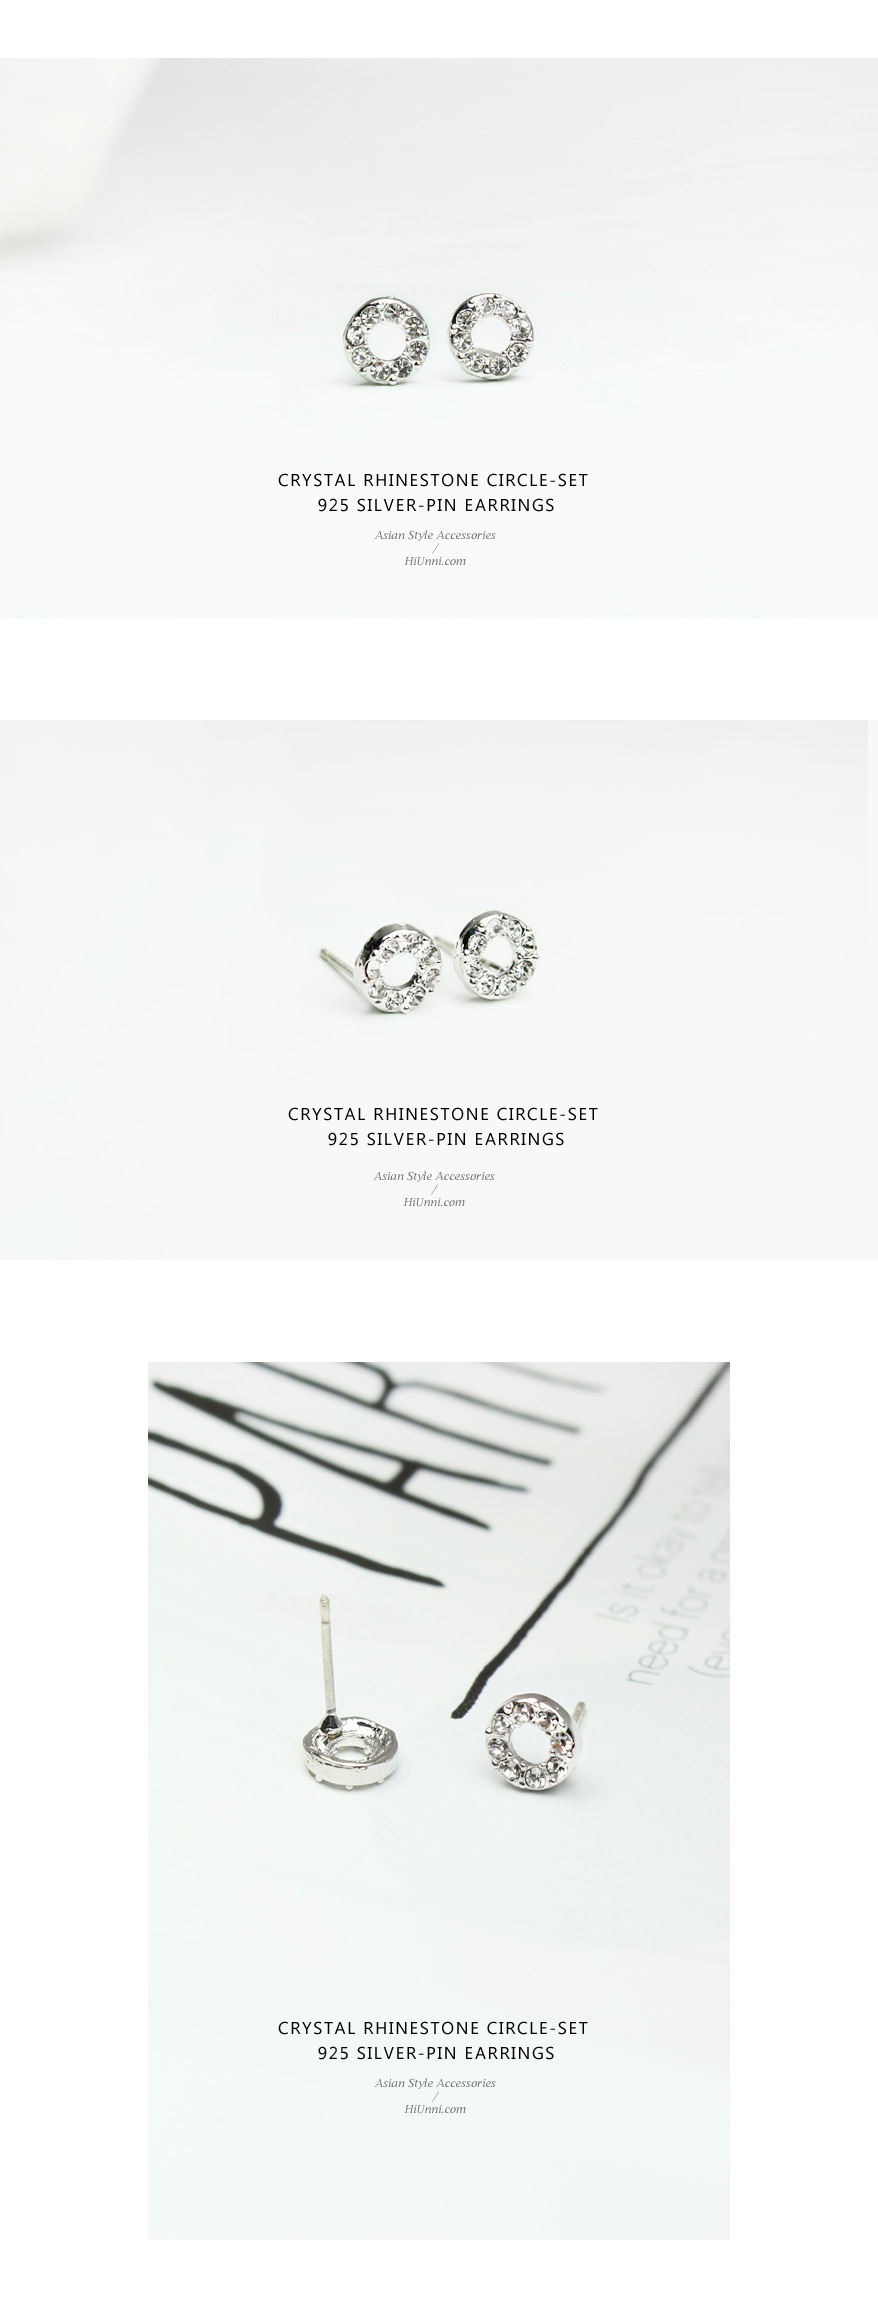 accessories_ear_stud_earrings_korean_asian-style_Crystal_Rhinestone_925-silver_Rhodium-Plated_Nickel-Free_Circle-set_1